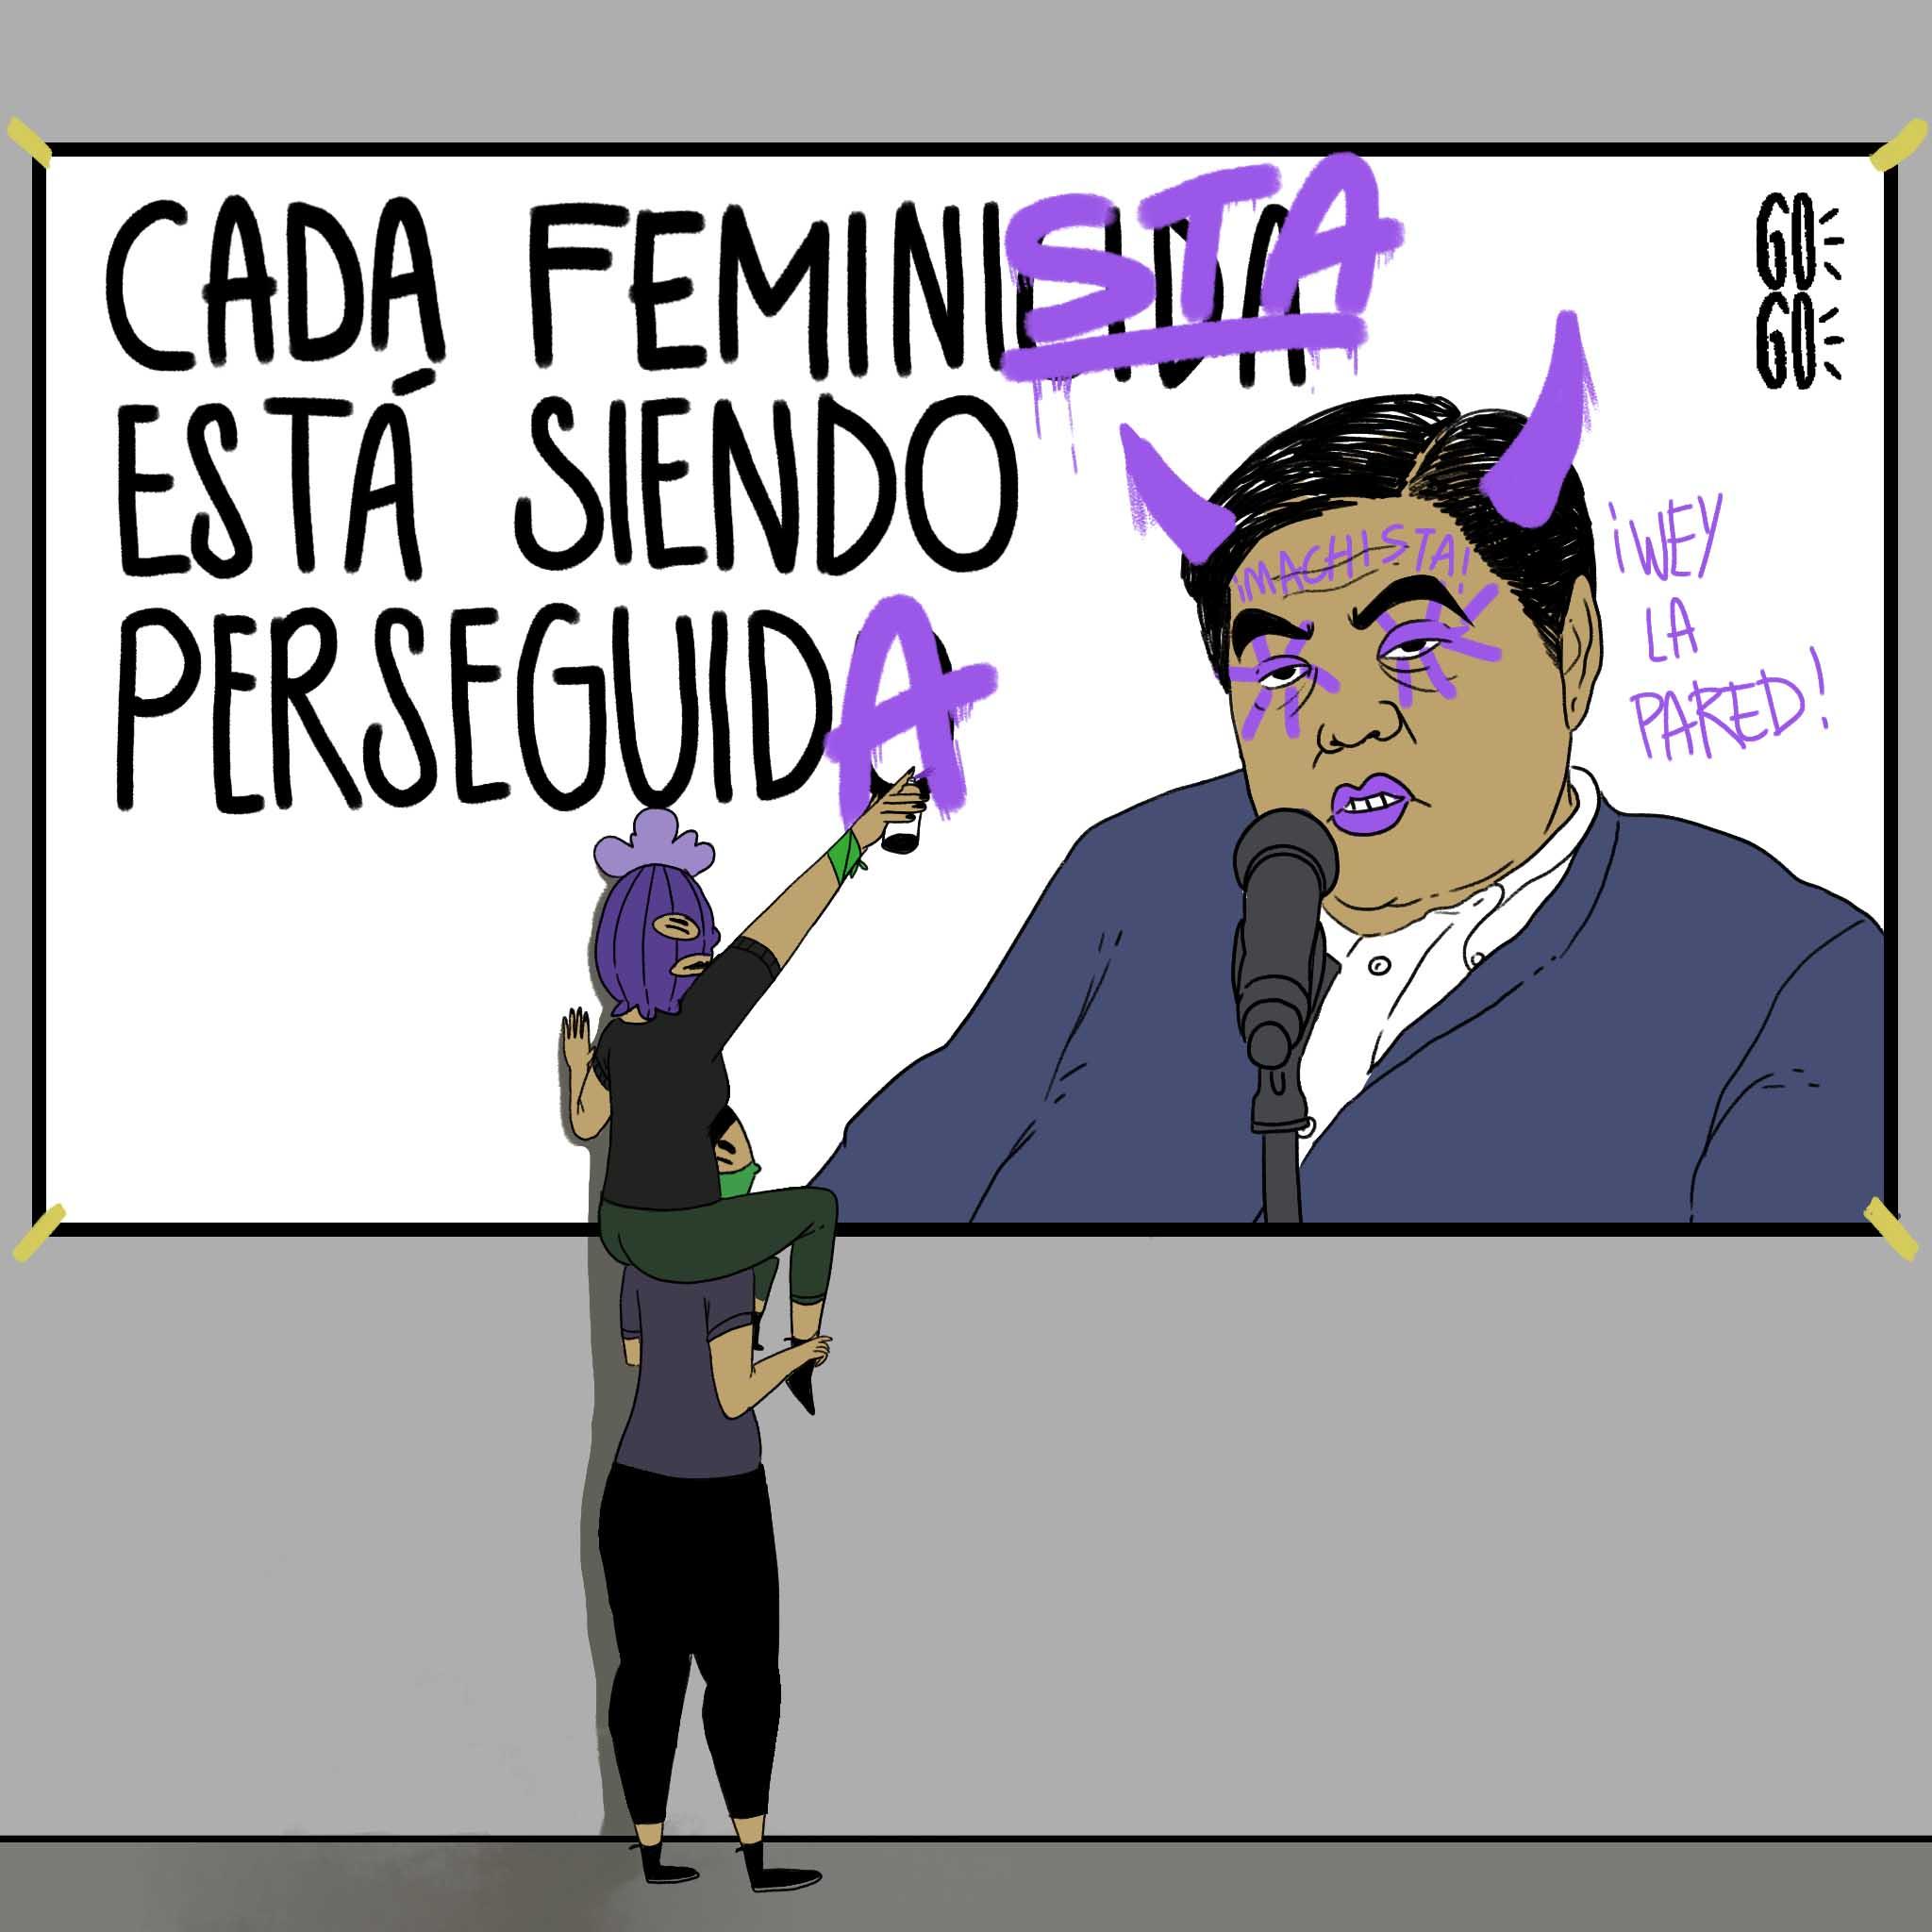 Cada feminista está siendo perseguida